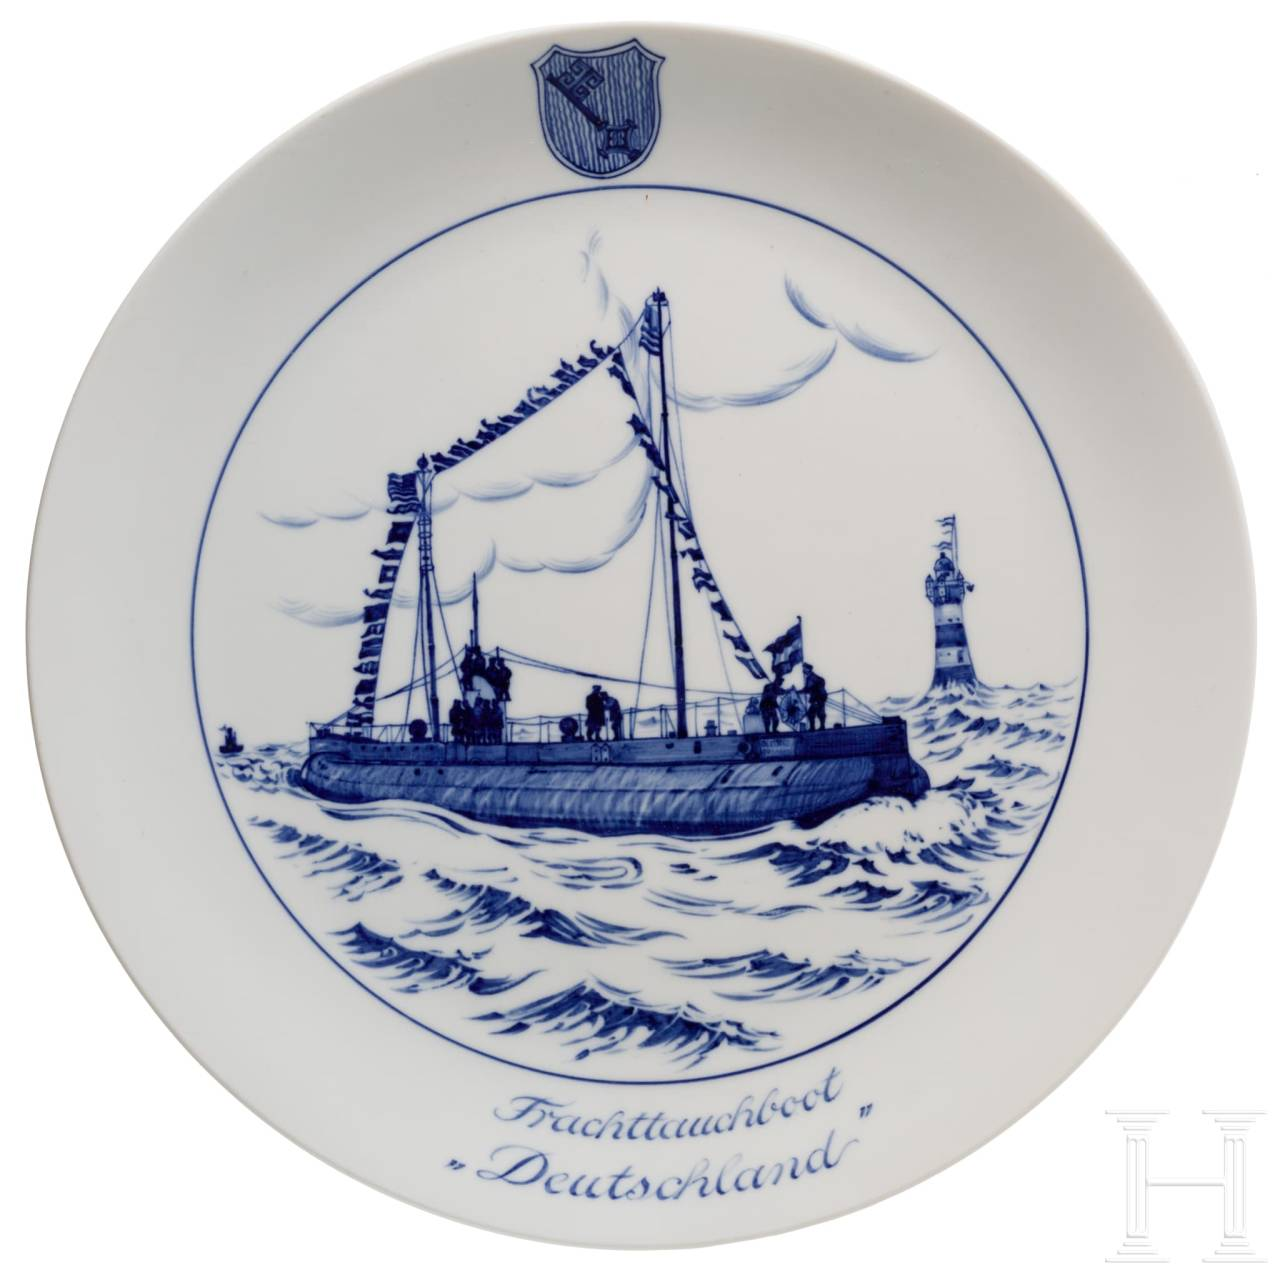 "A Meissen - commemorative plate for the crew members of the ""Frachttauchboot Deutschland"""